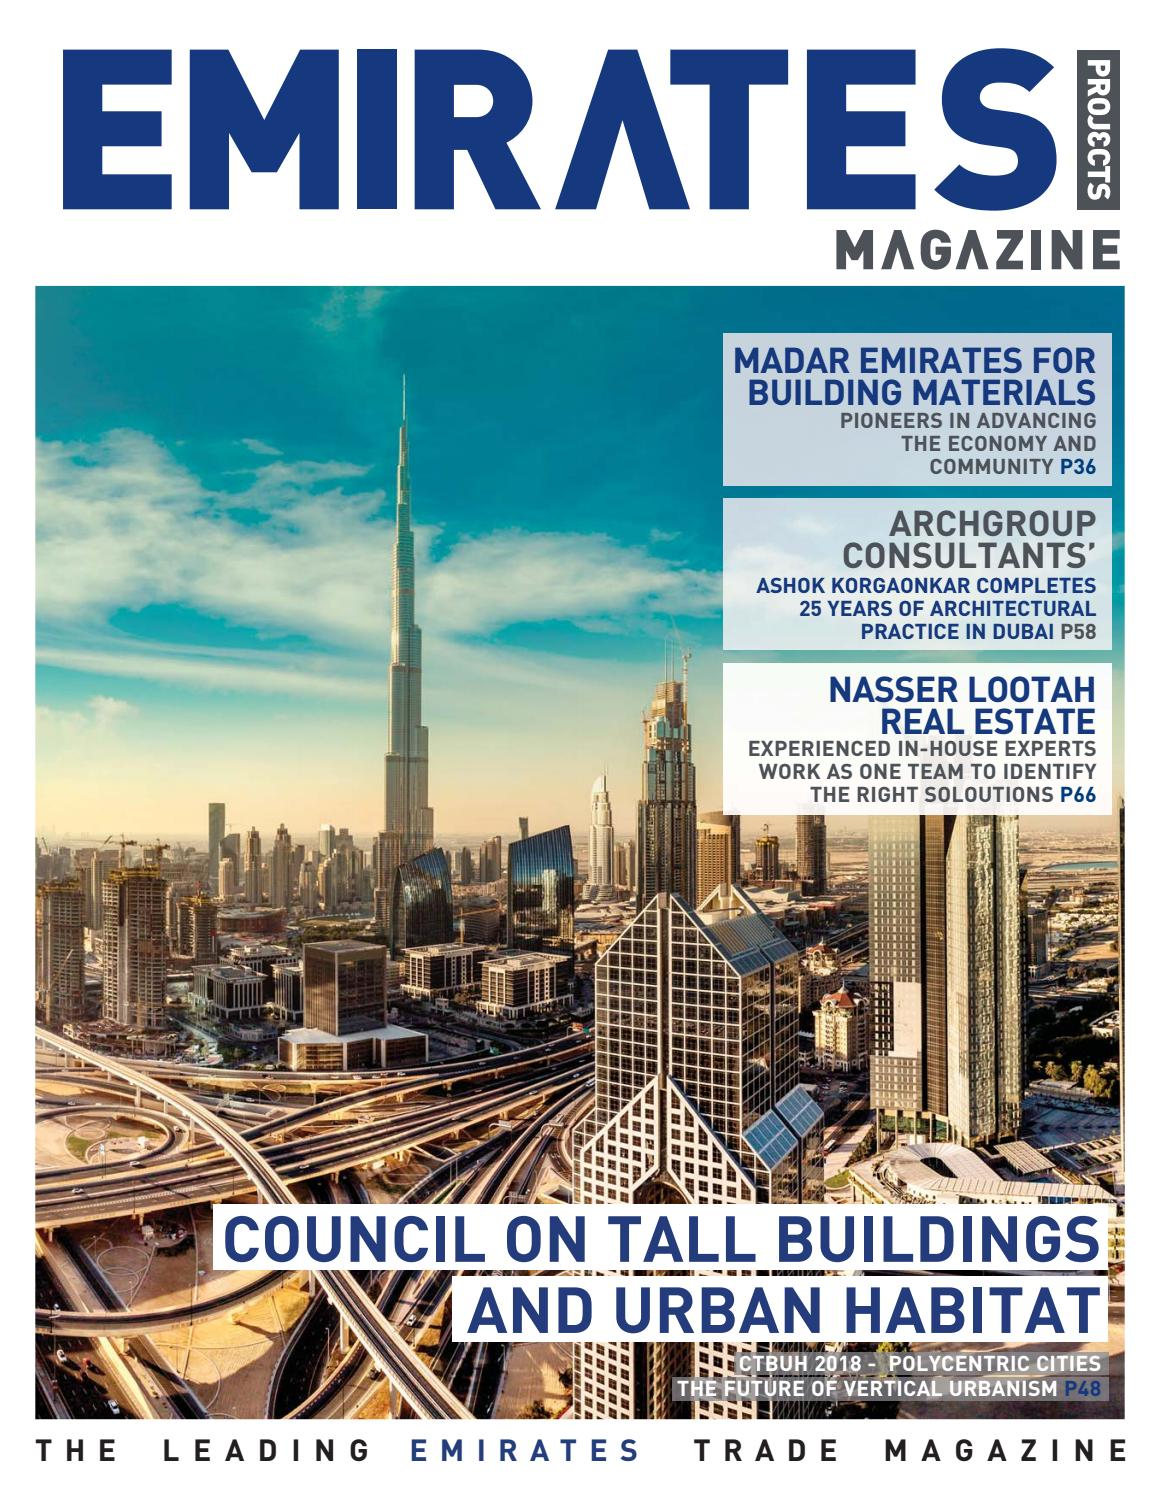 Madar Emirates For Building Materials